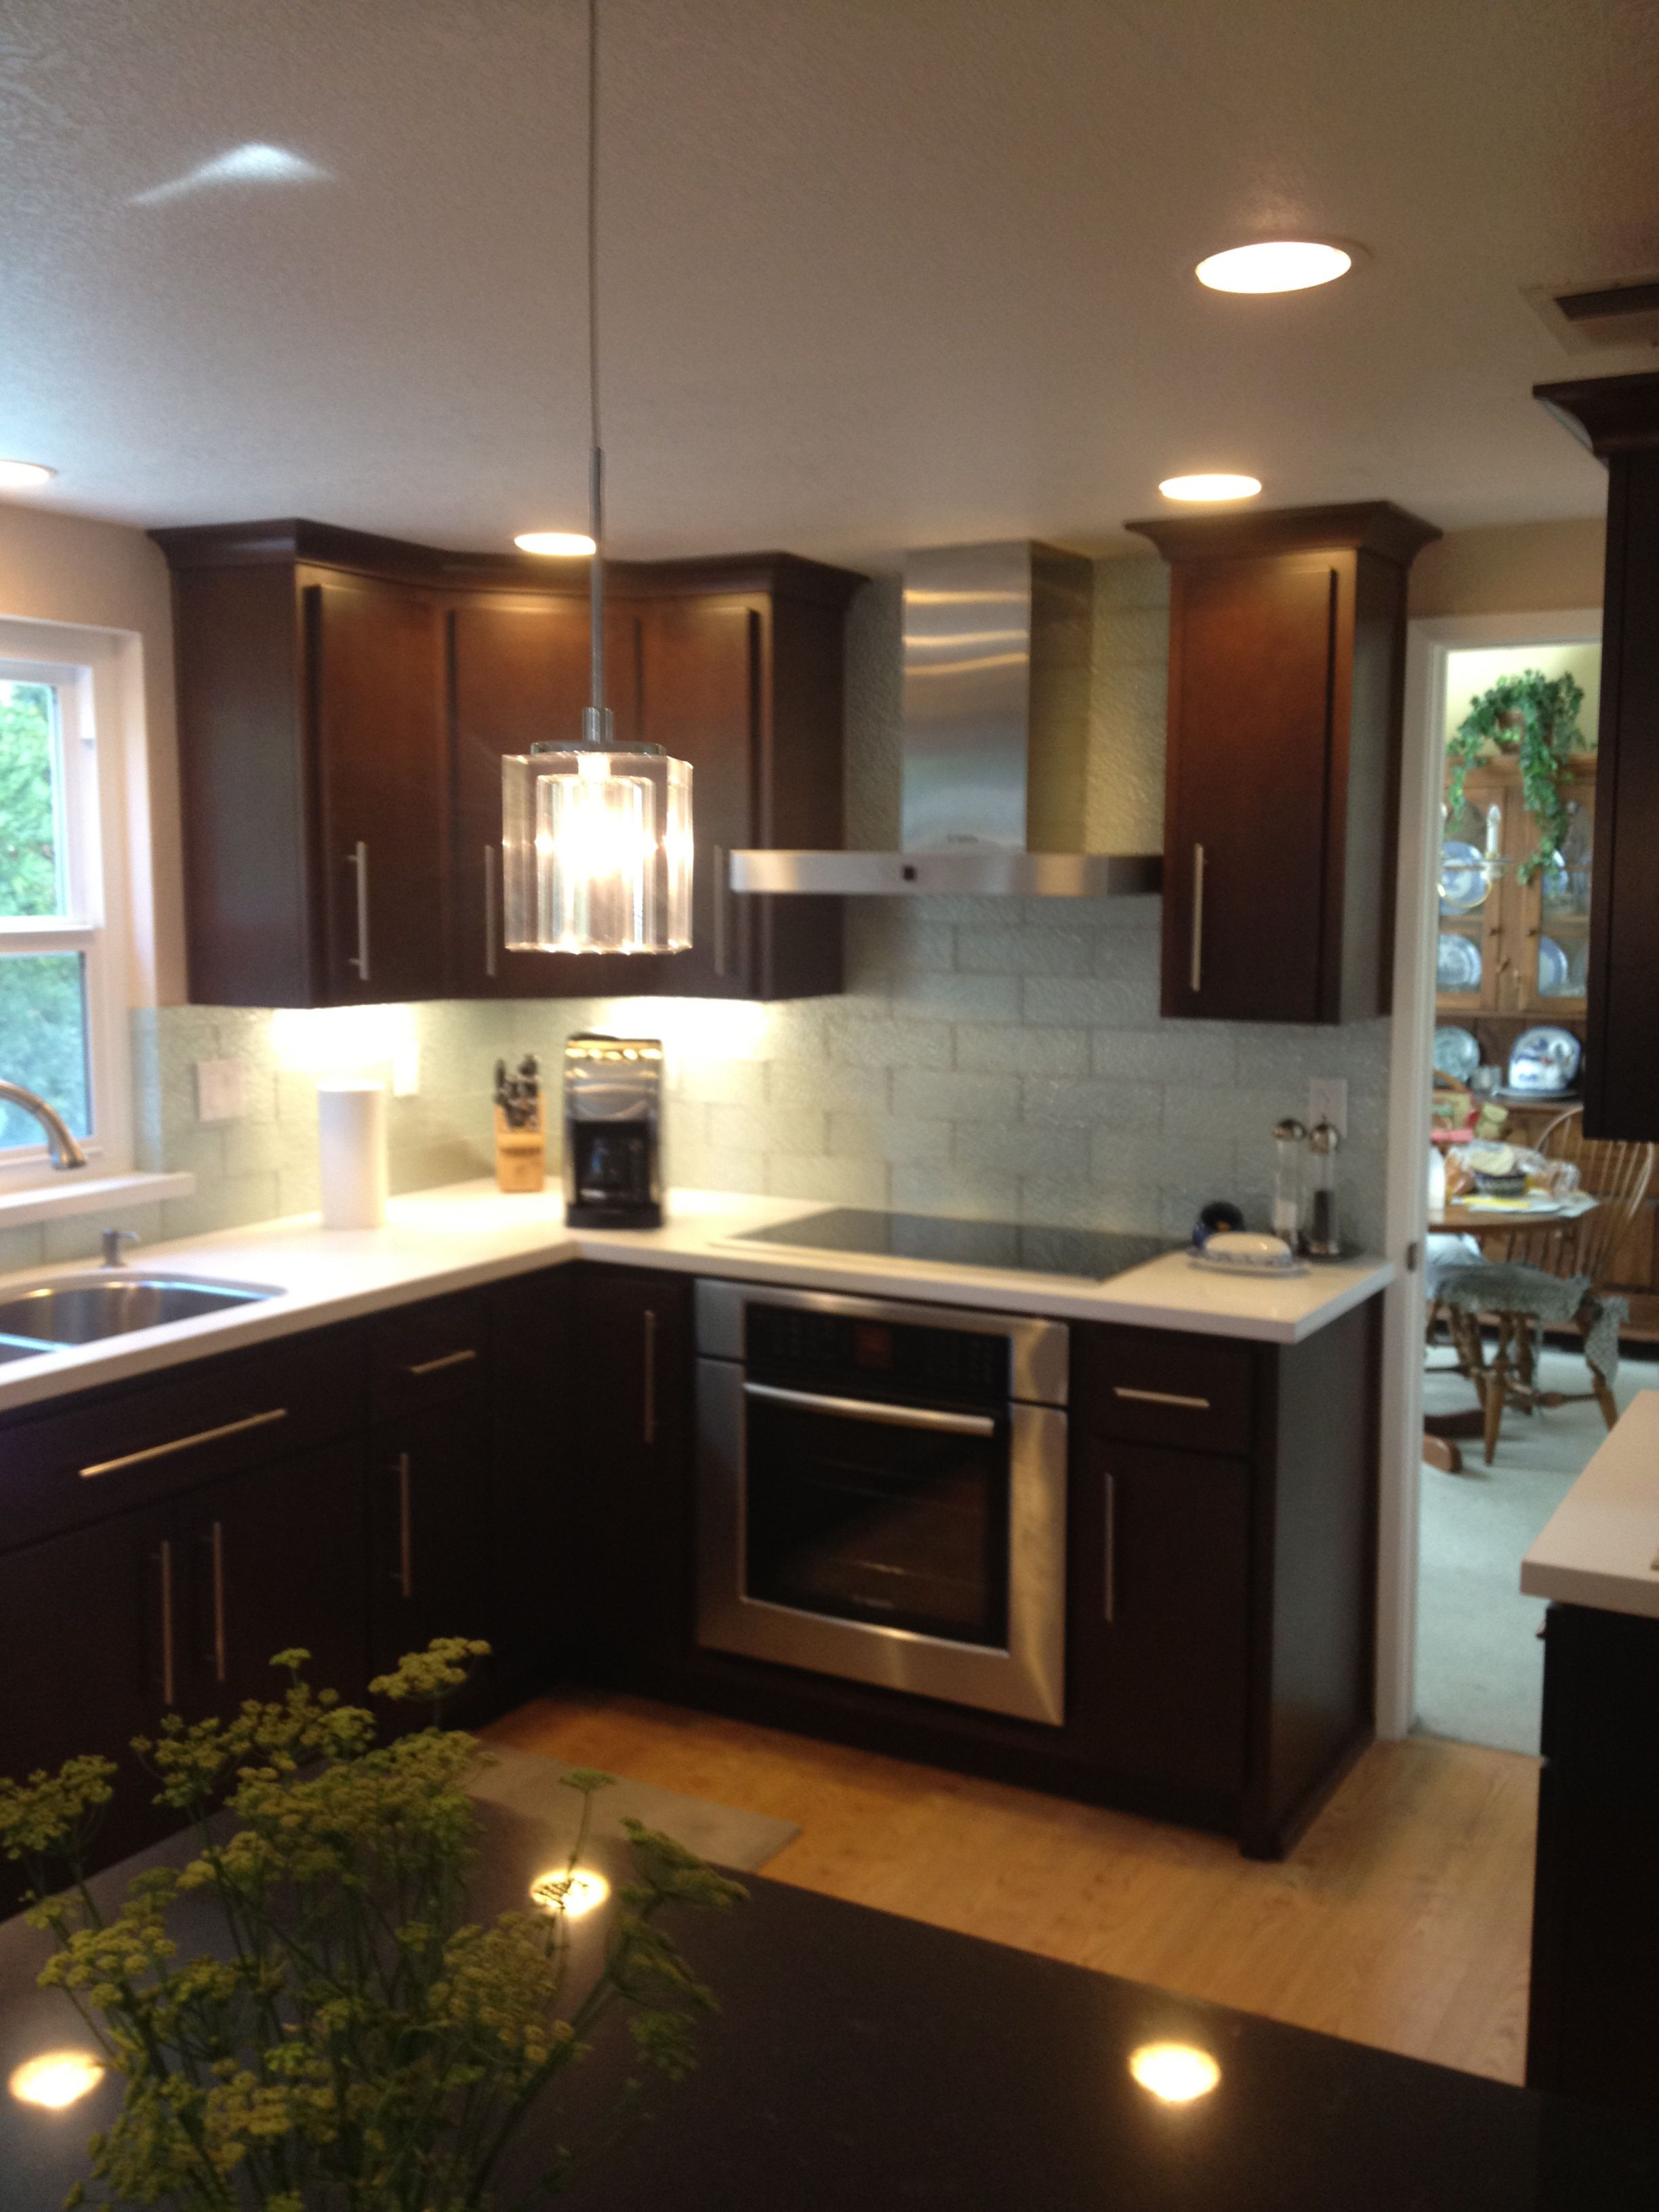 Bay area kitchen remodel avilas construction | Kitchen ...